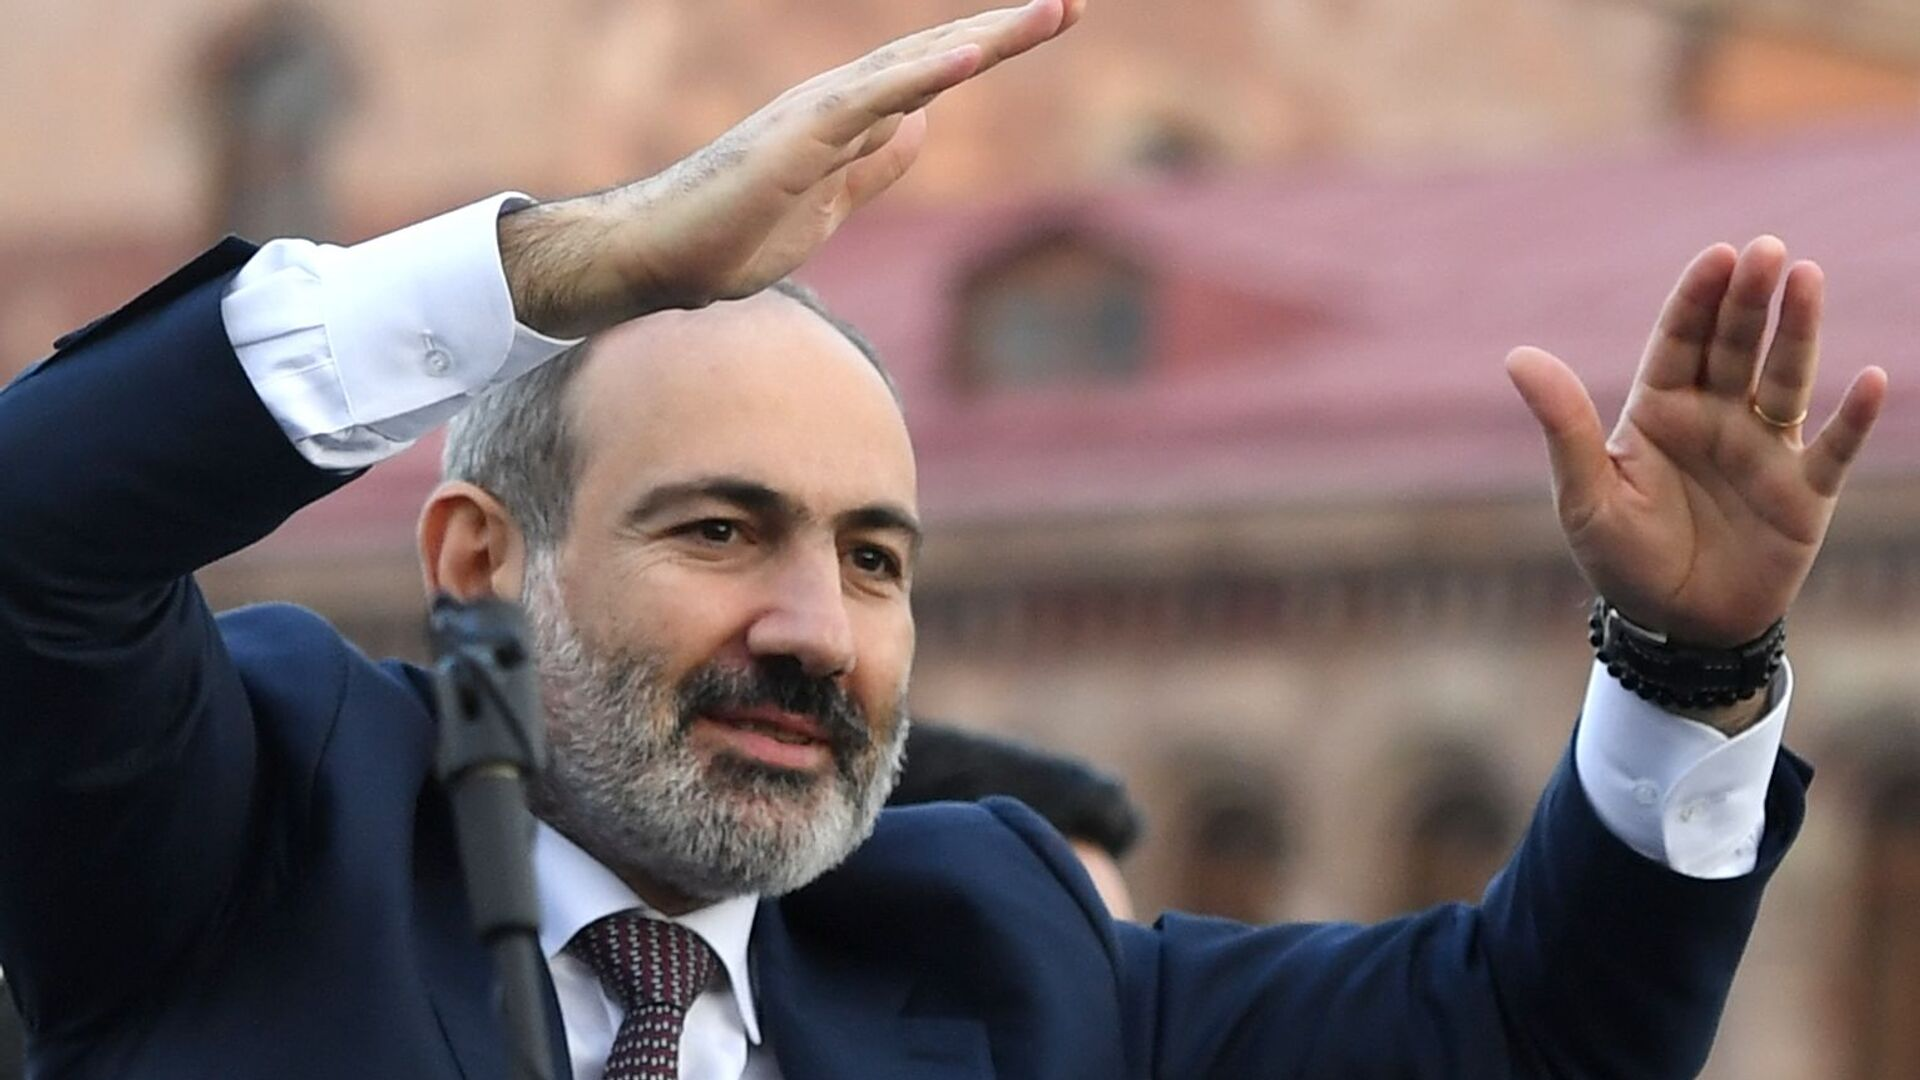 Il primo ministro Nikol Pashinyan - Sputnik Italia, 1920, 01.03.2021